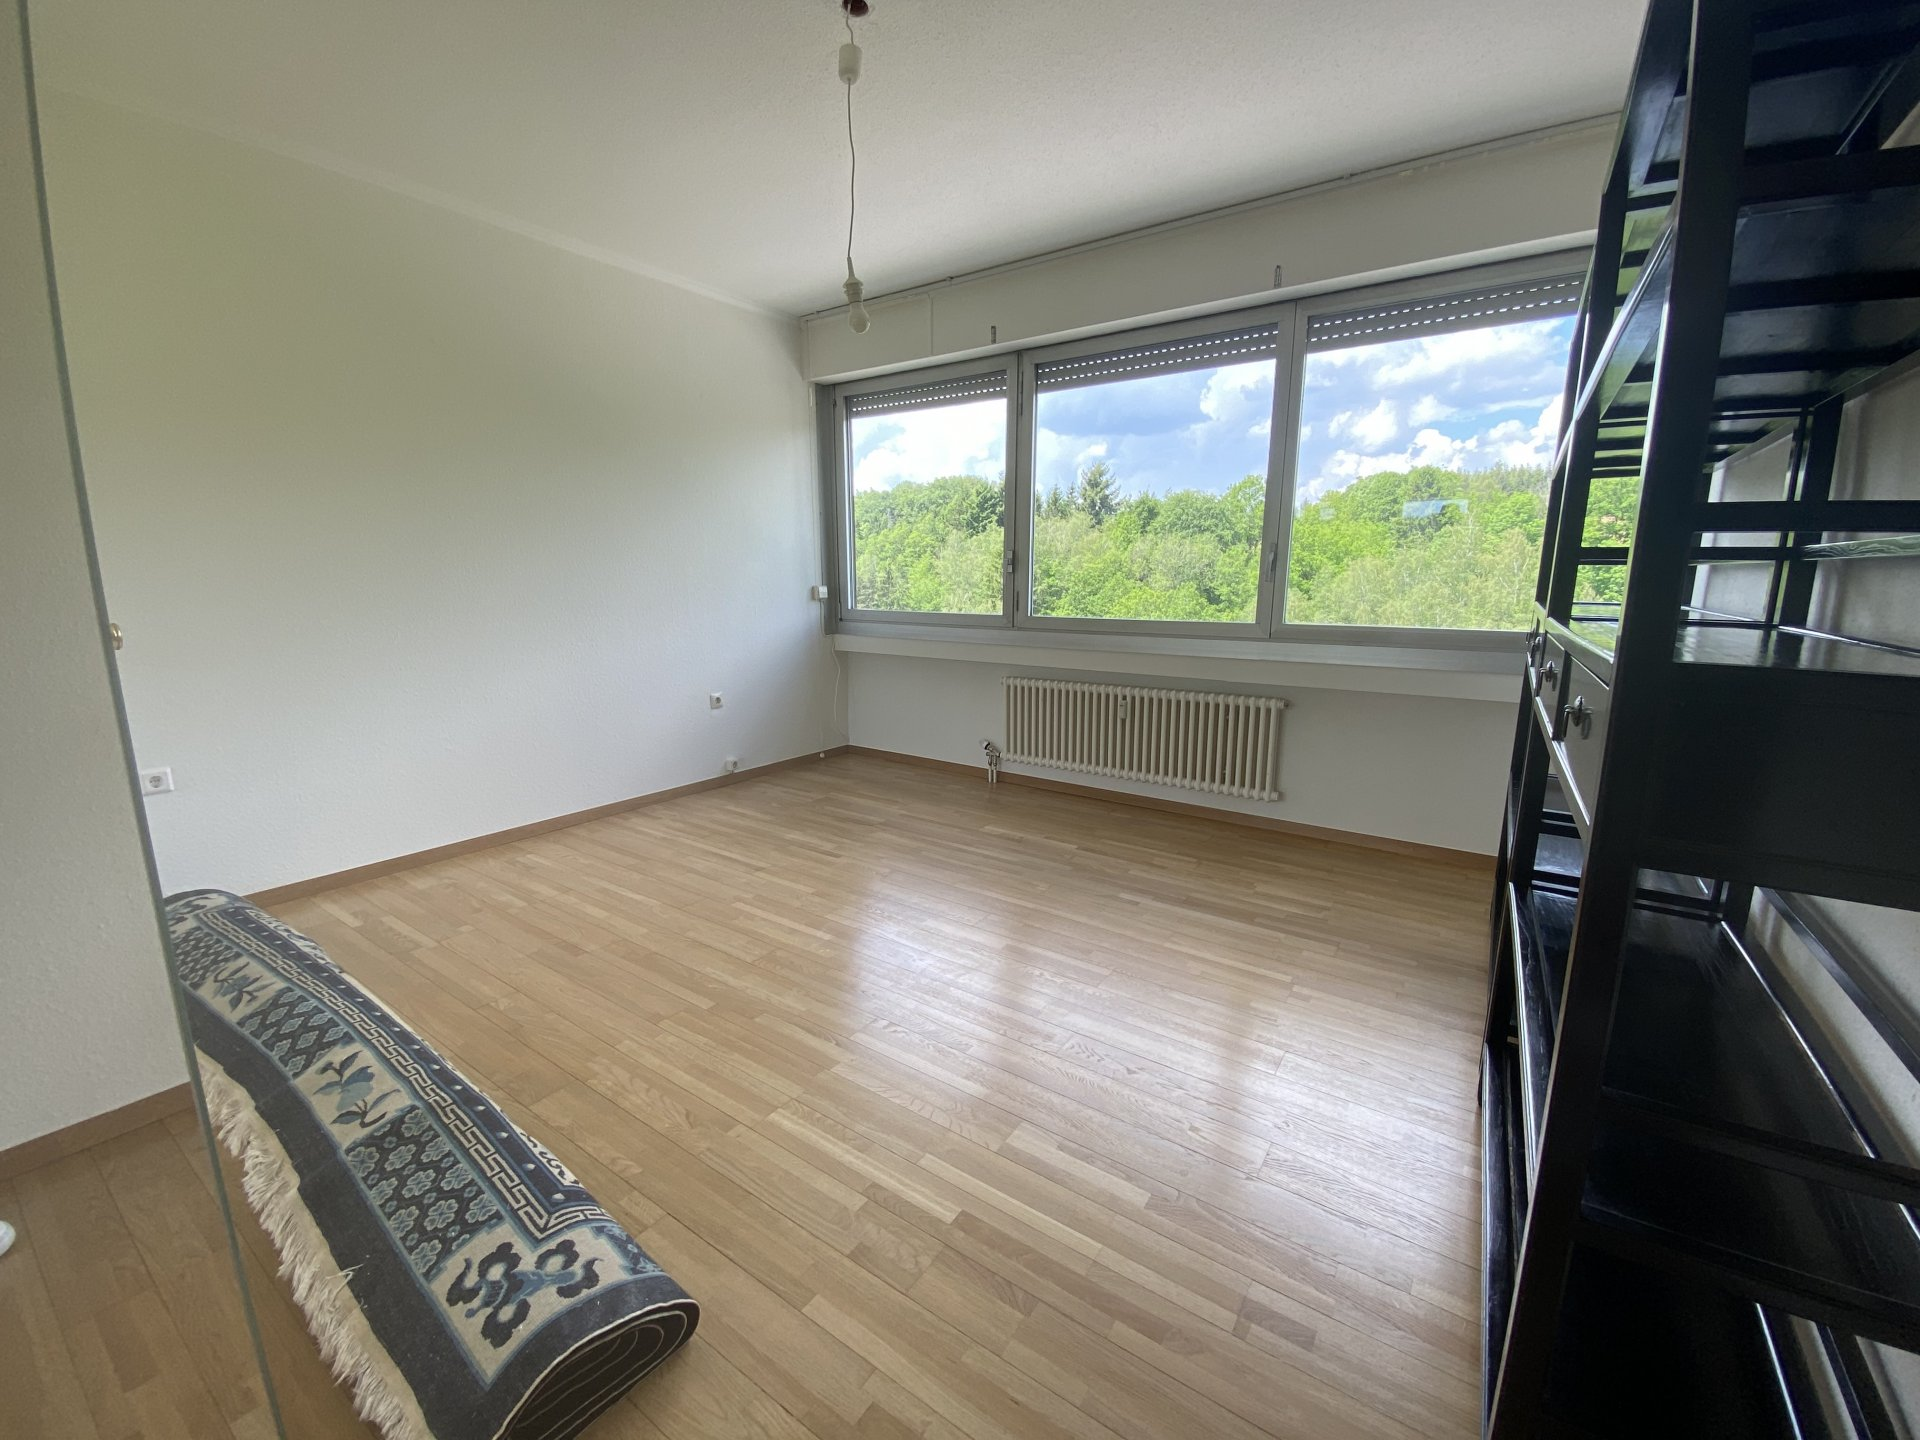 Appartement 3 chambres à louer - Luxembourg-Dommeldange